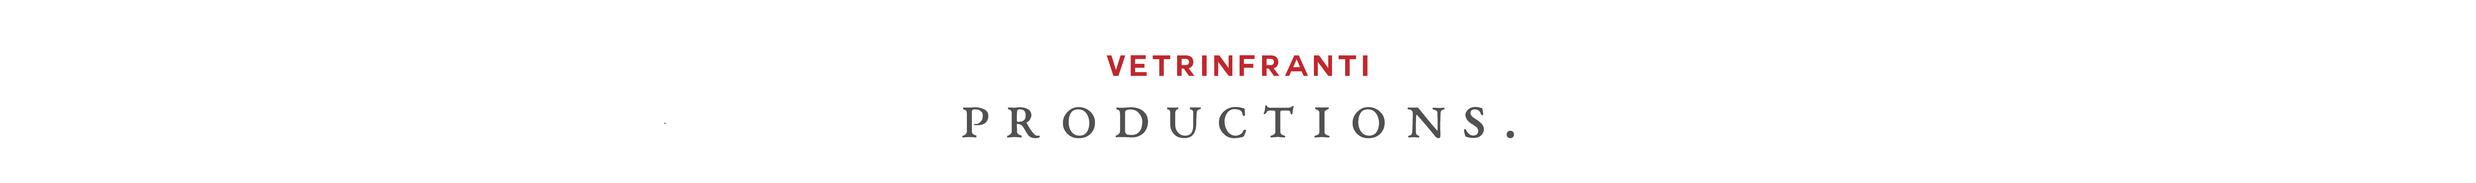 VETRINFRANTI PRODUCTIONS